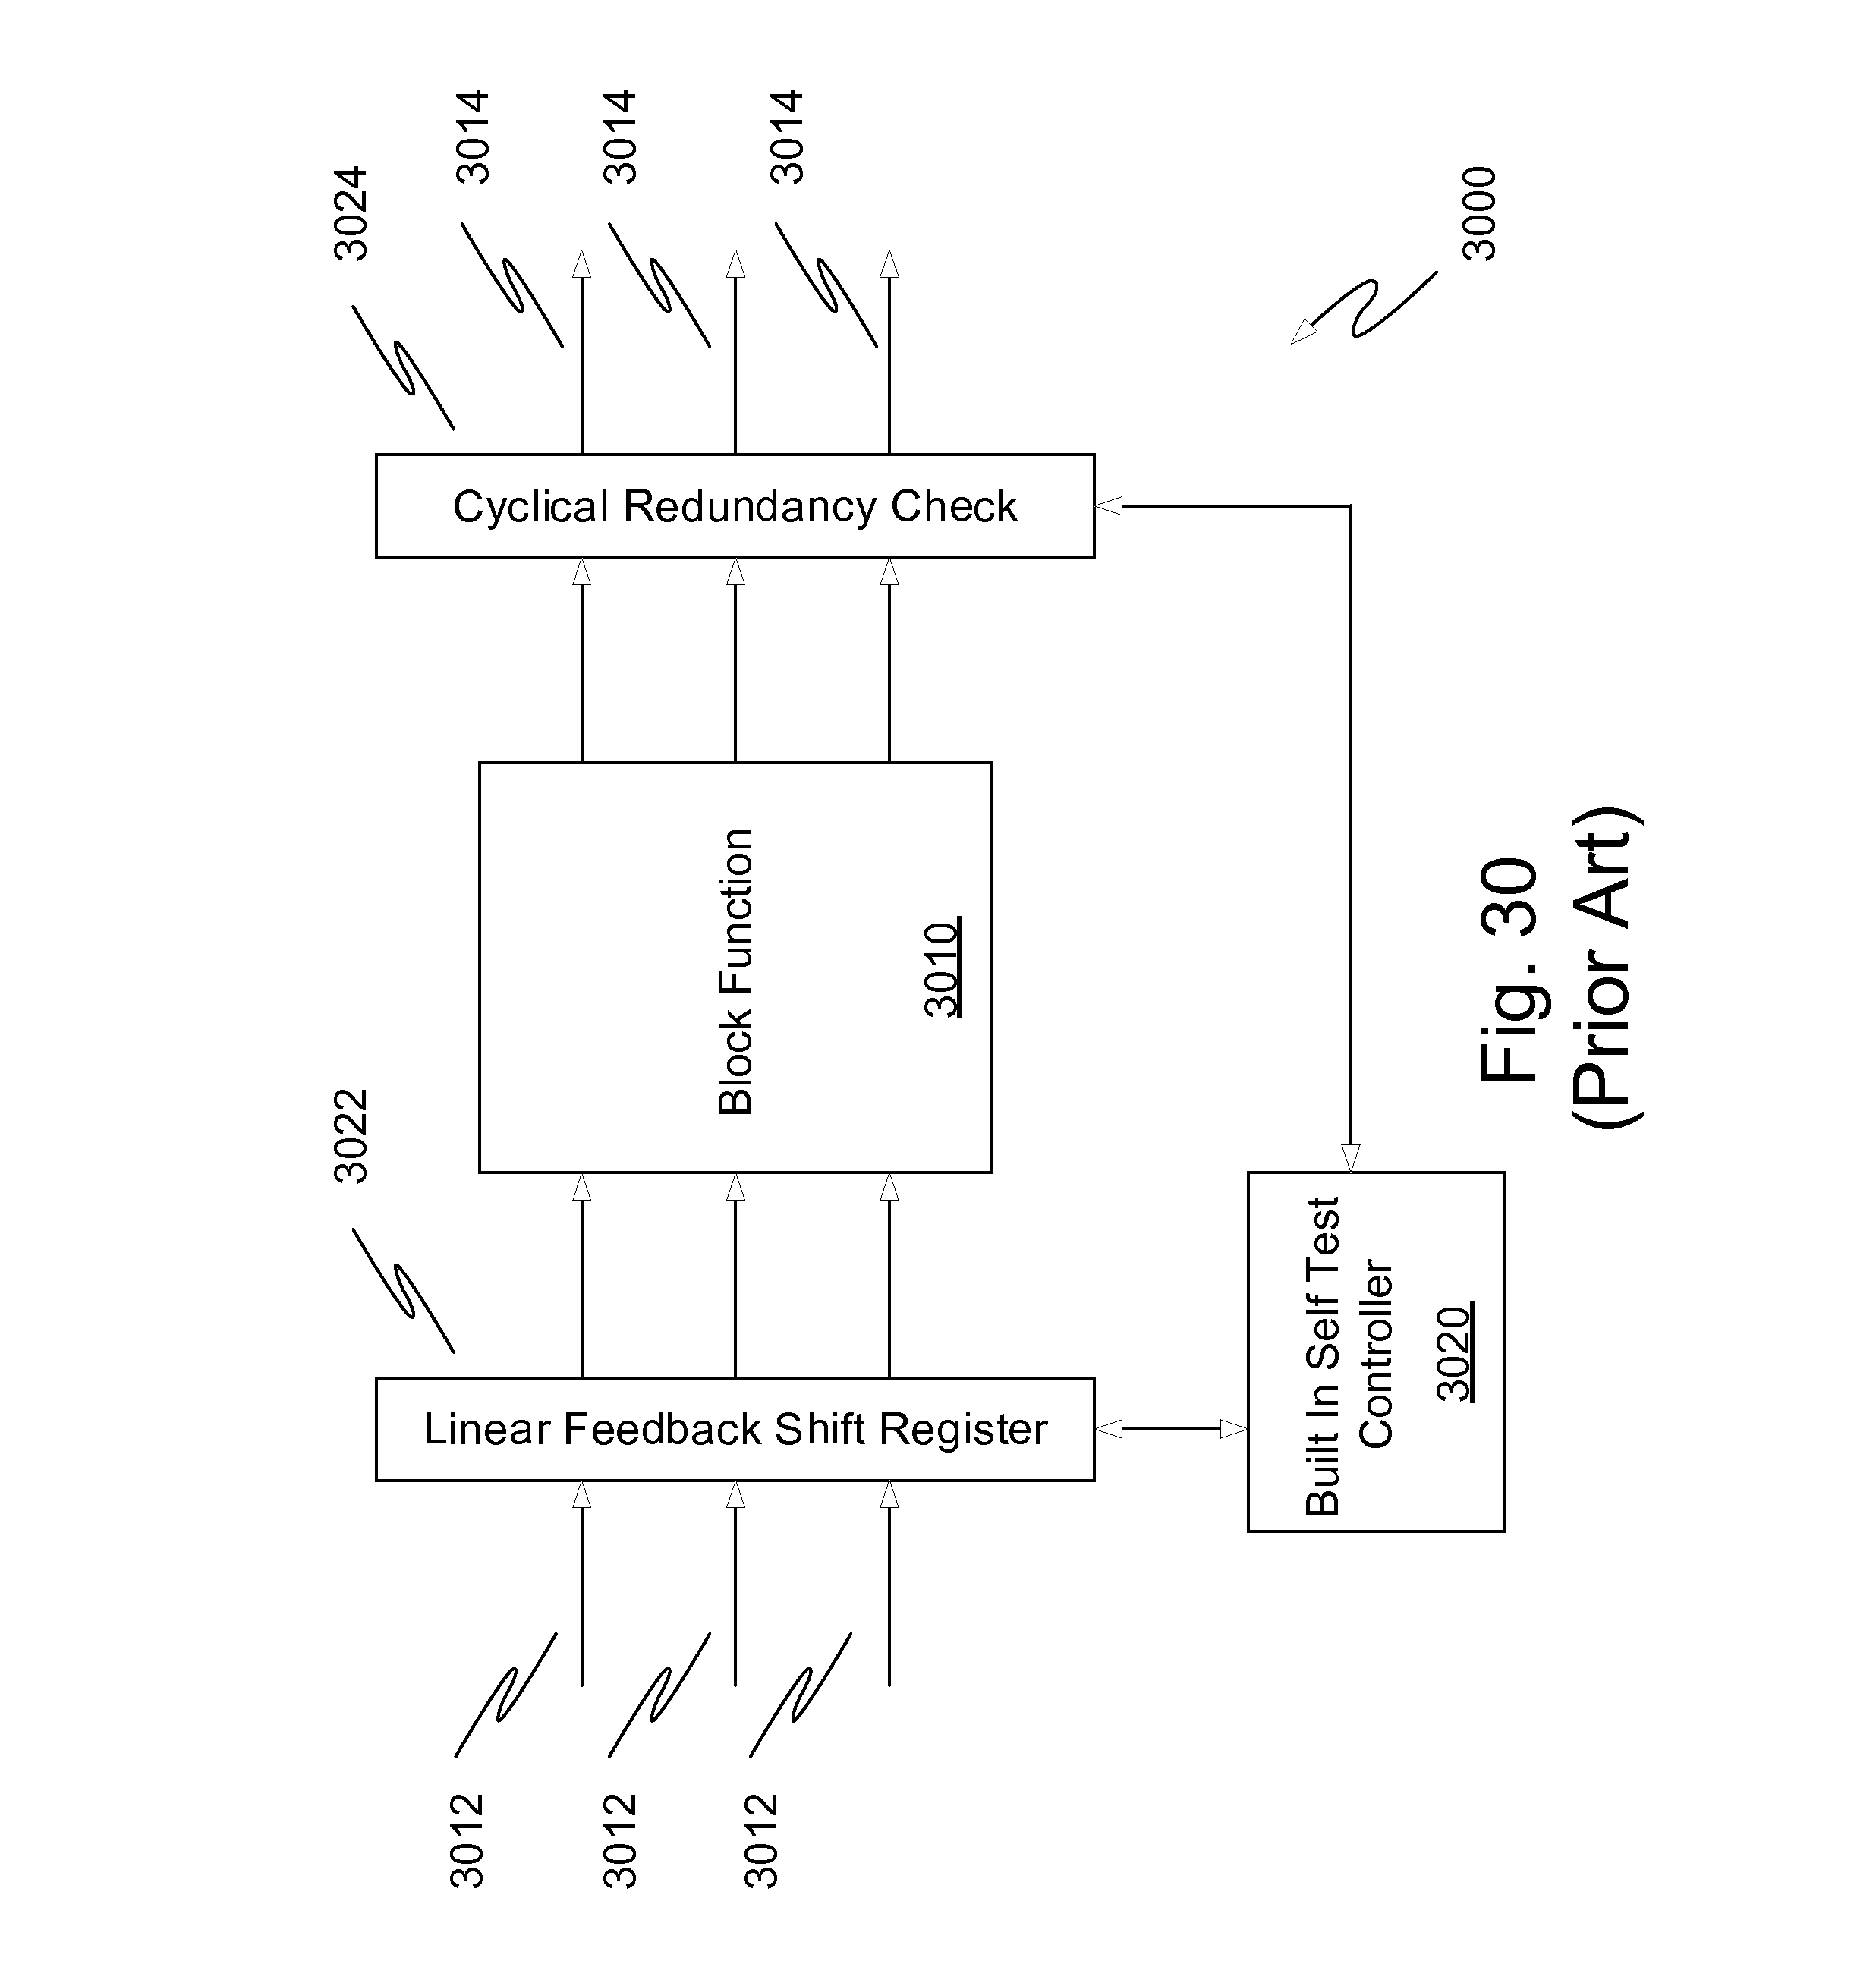 patent us 8 846 463 b1 rh insight rpxcorp com